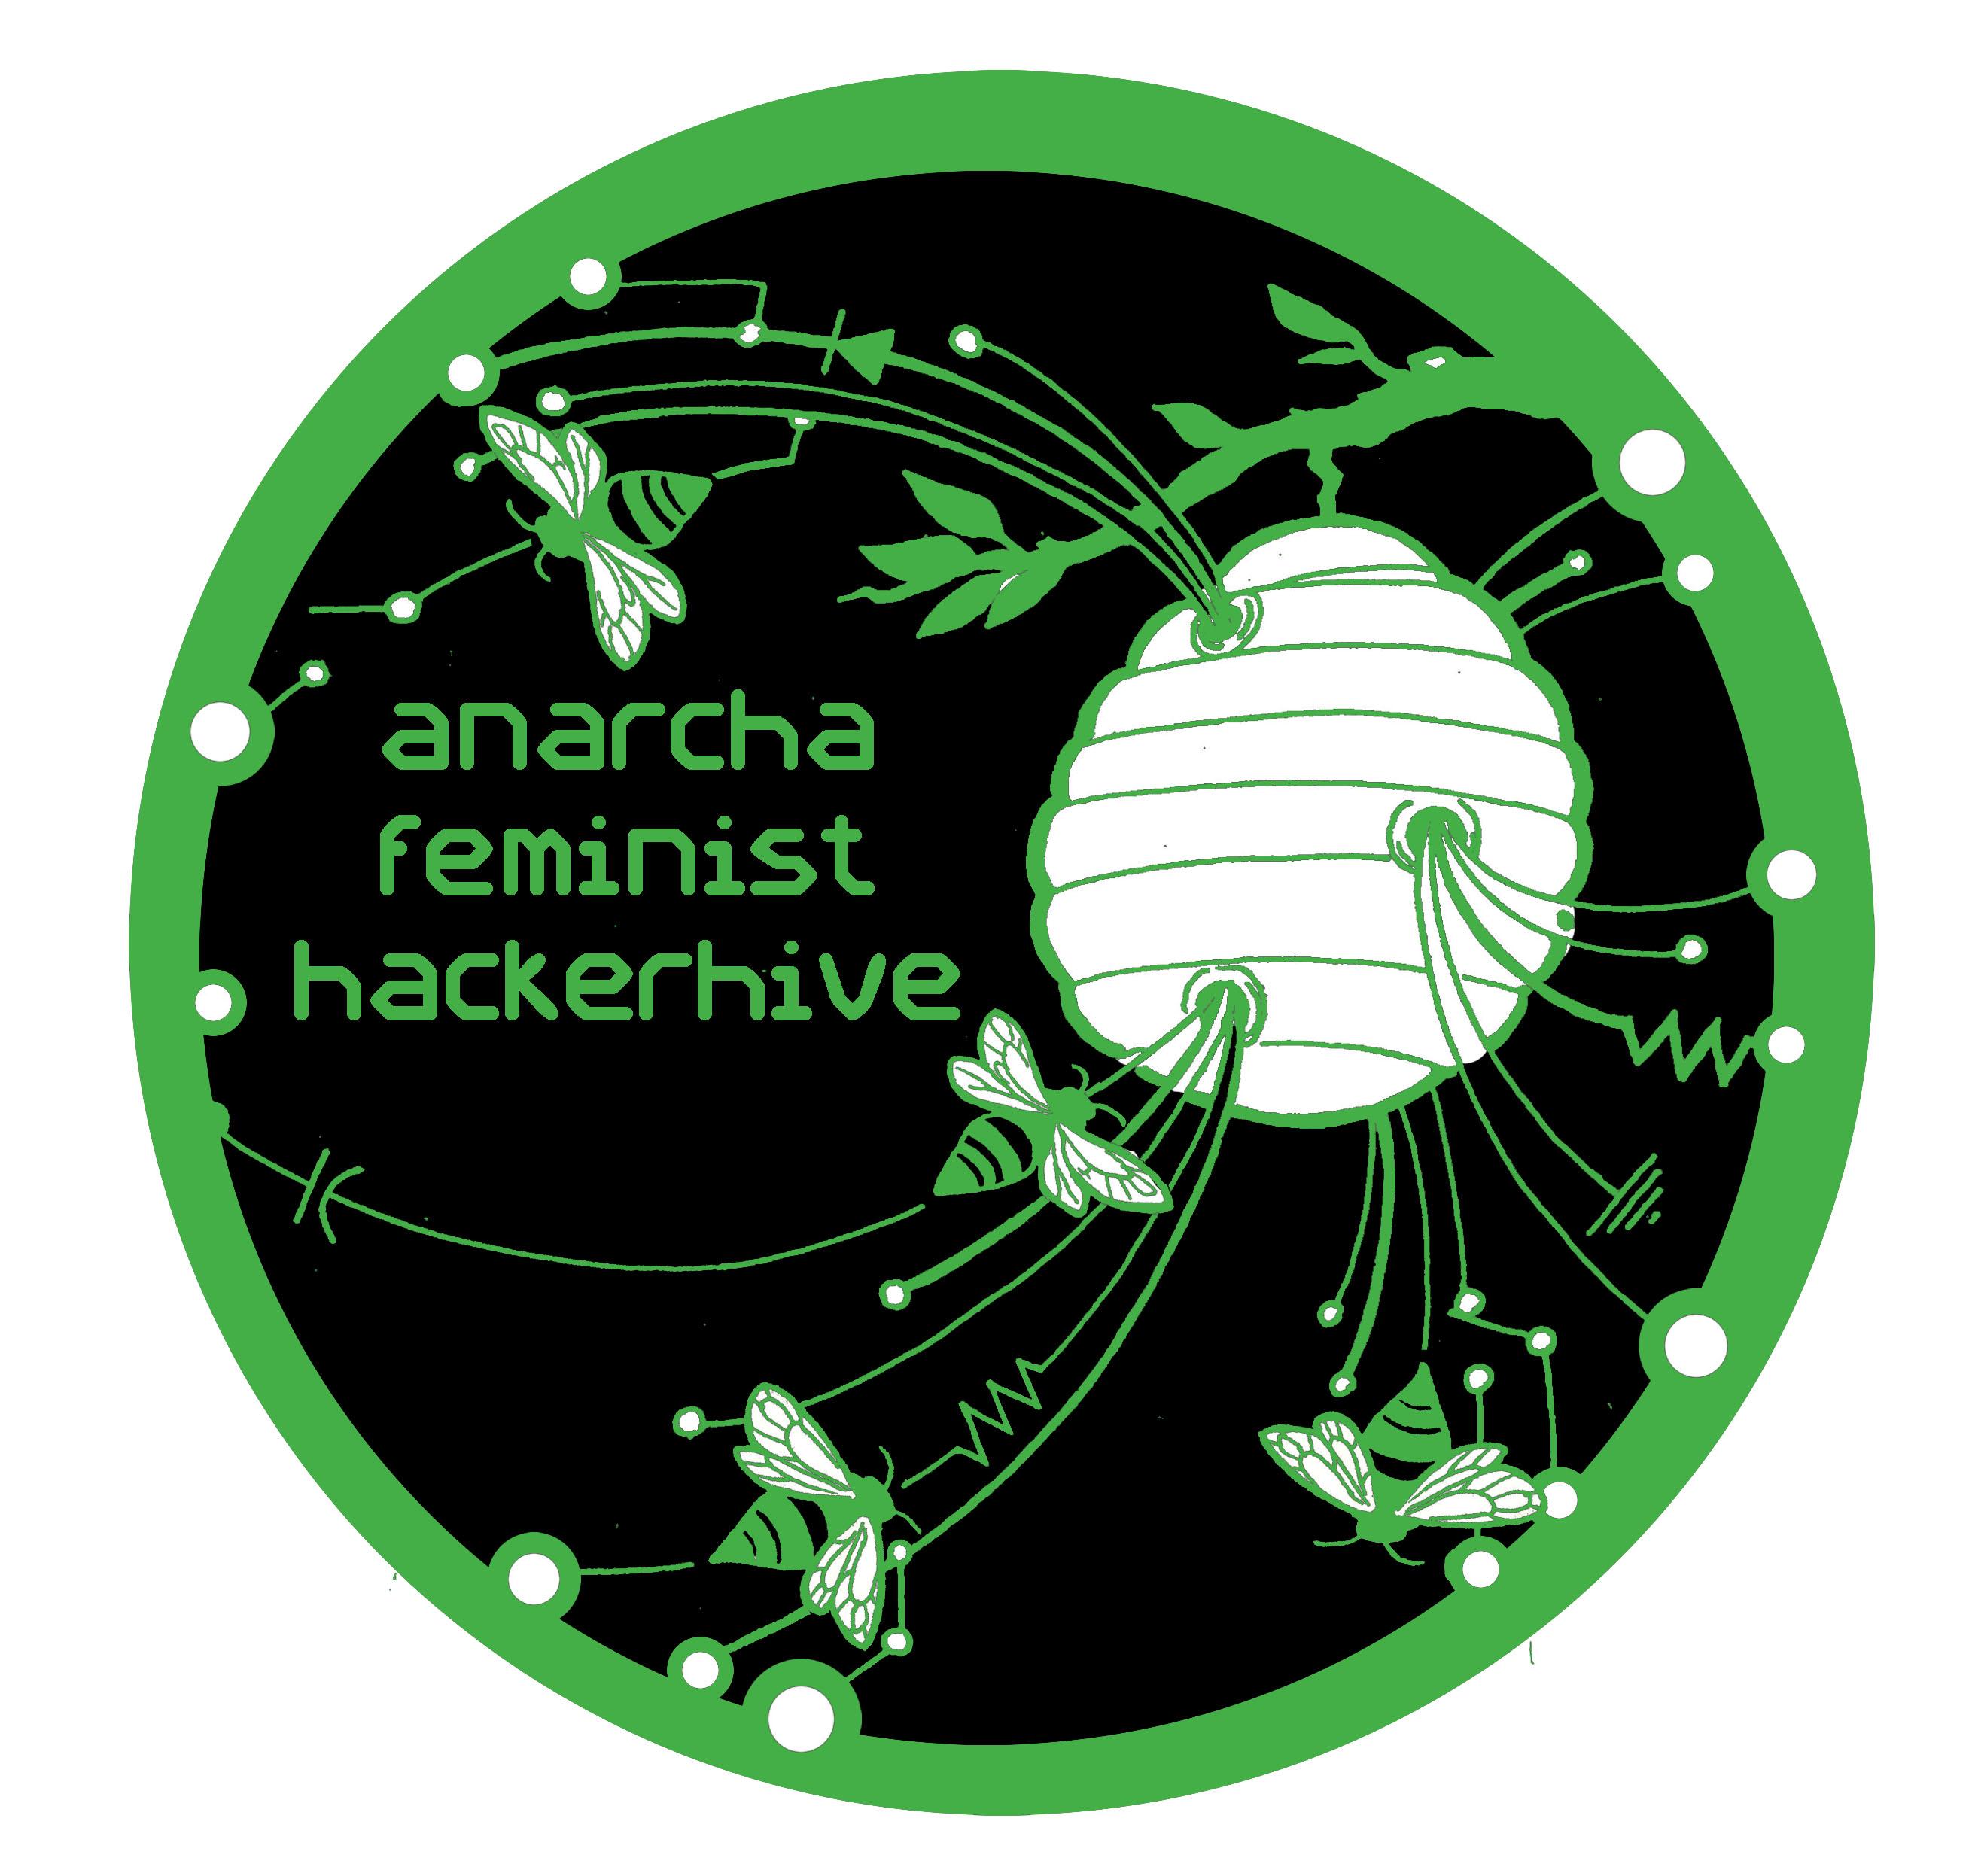 Anarchafeminist Hackerhive